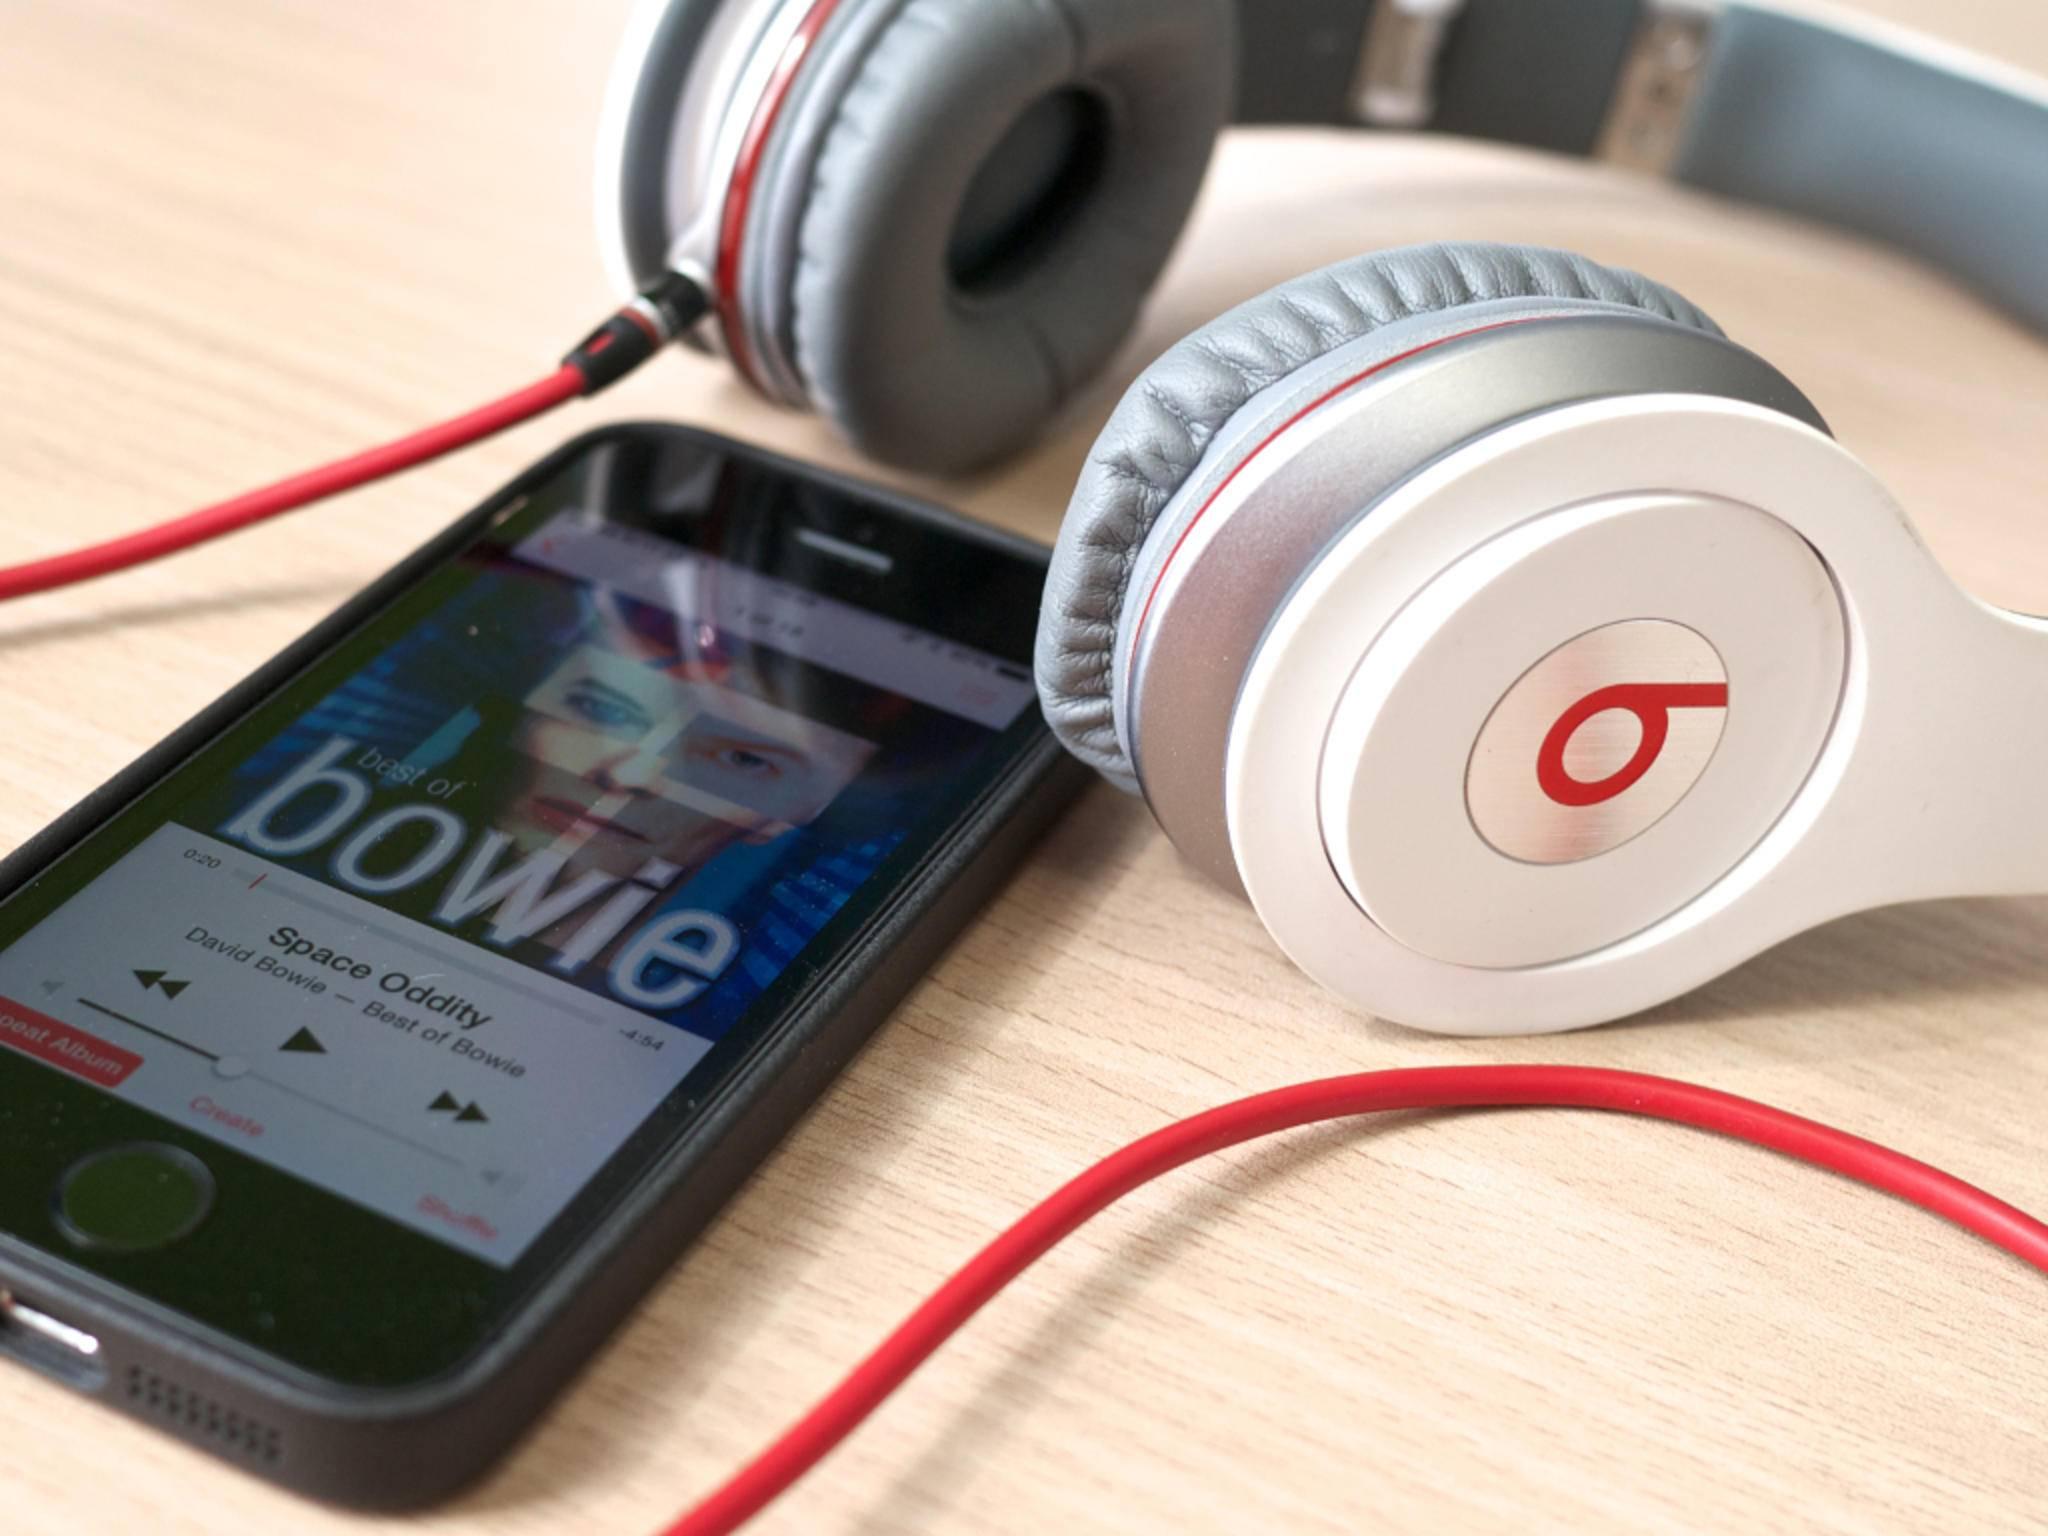 iPhone und Beats-Kopfhörer